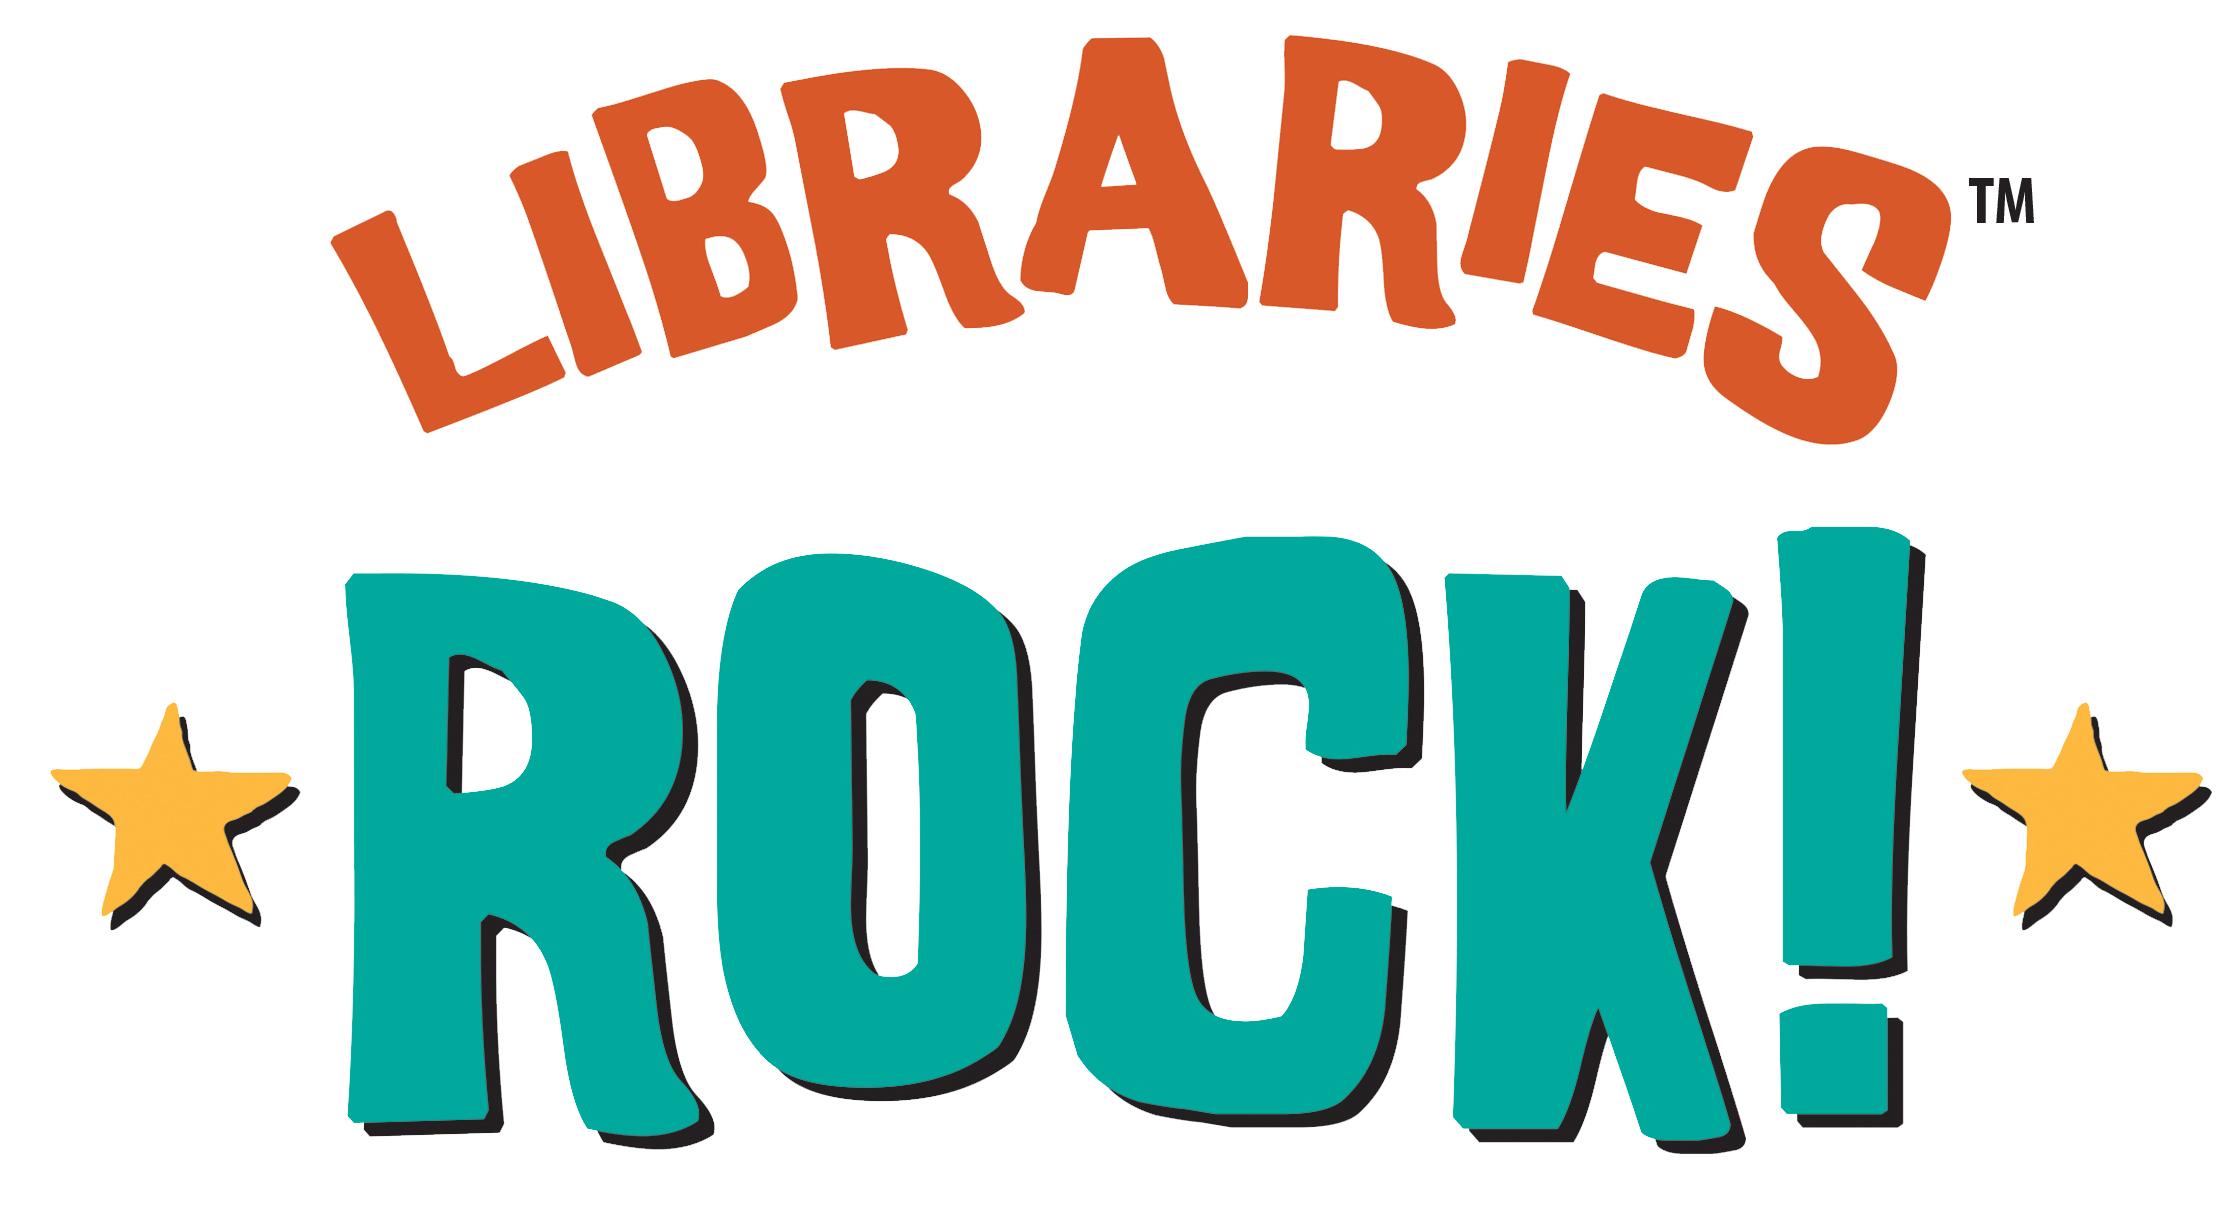 Libraries Rock large print slogan